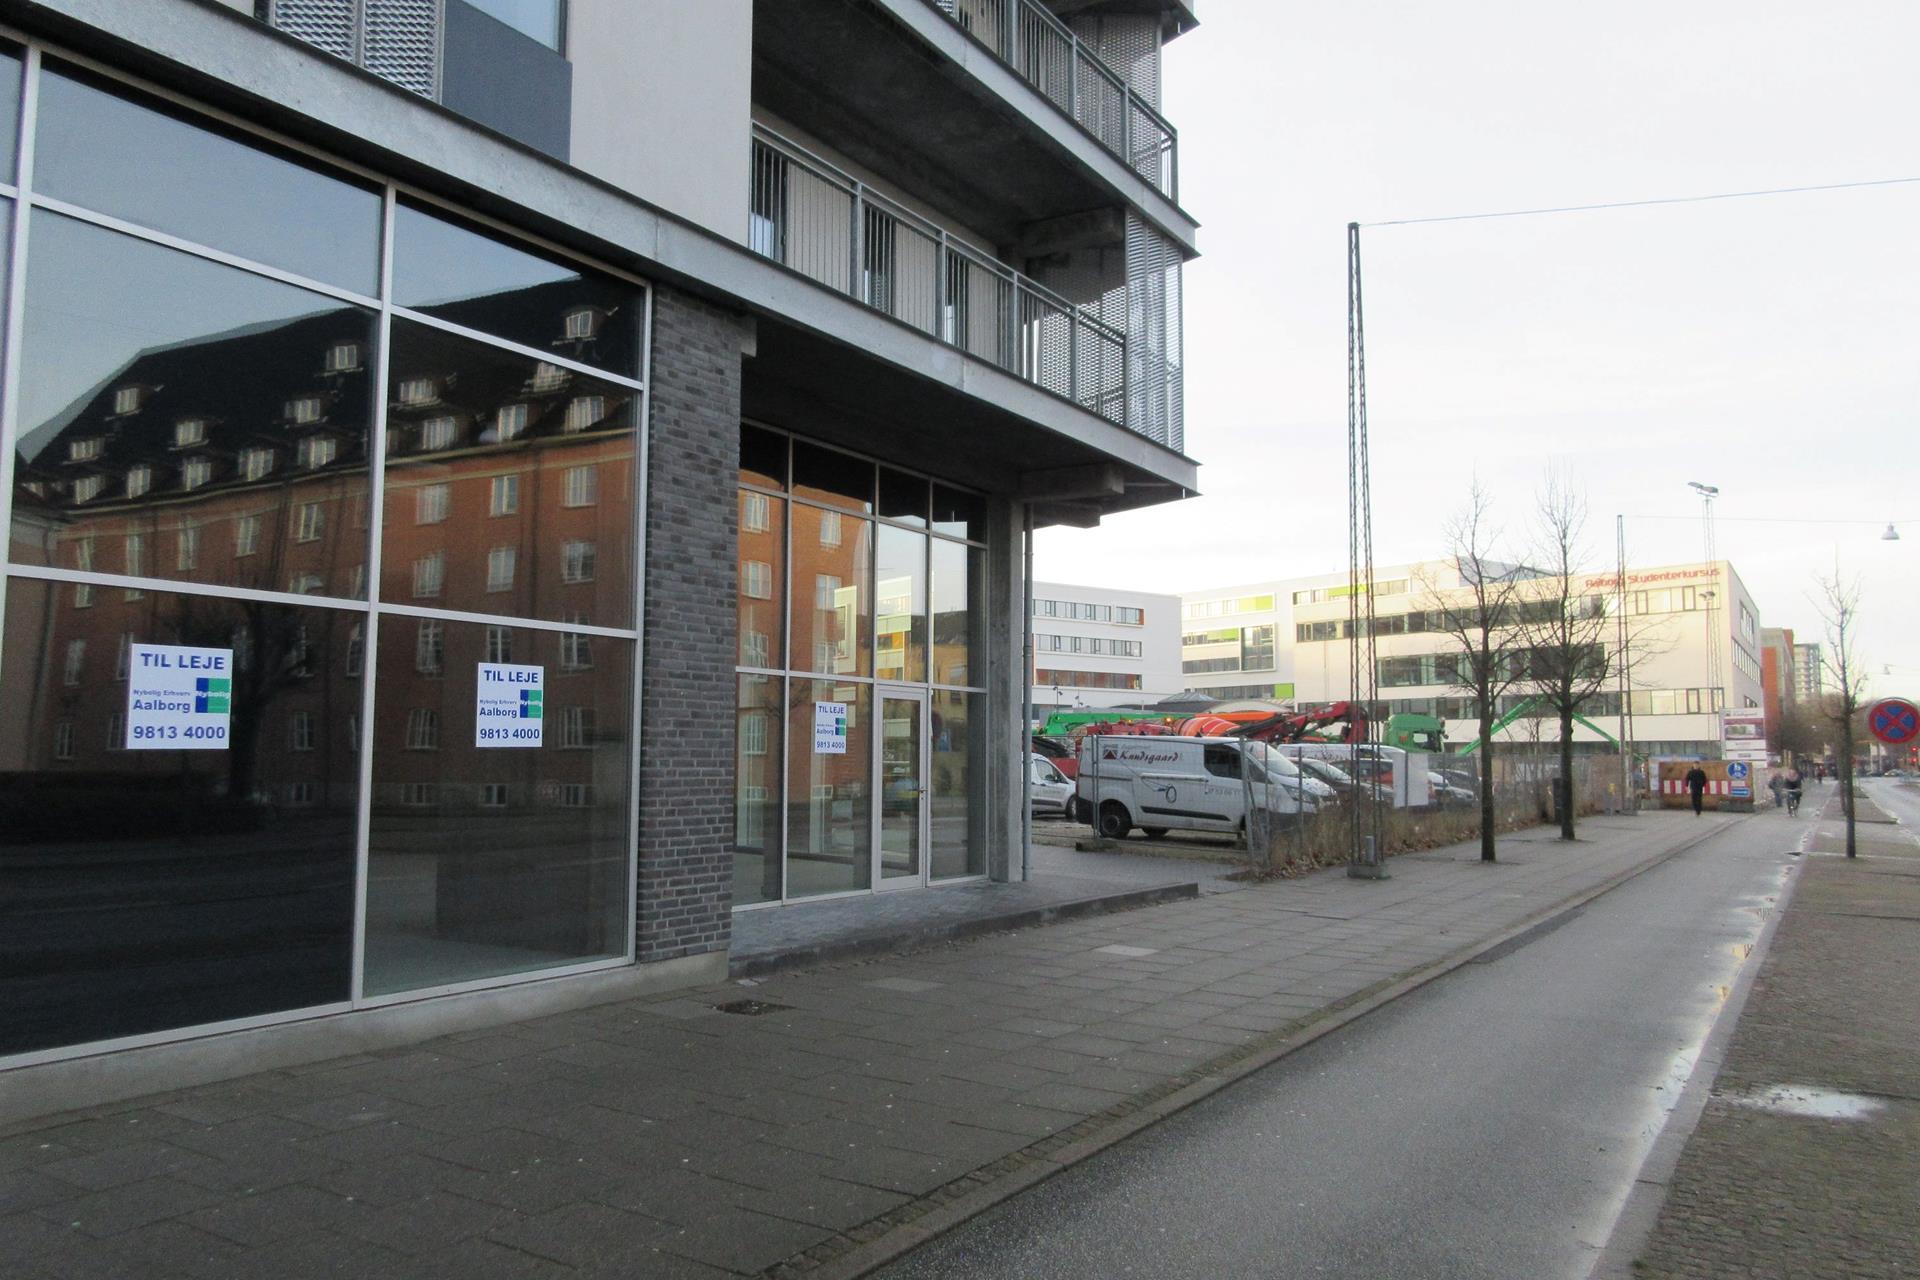 Detail på Godsbanen i Aalborg - Facade